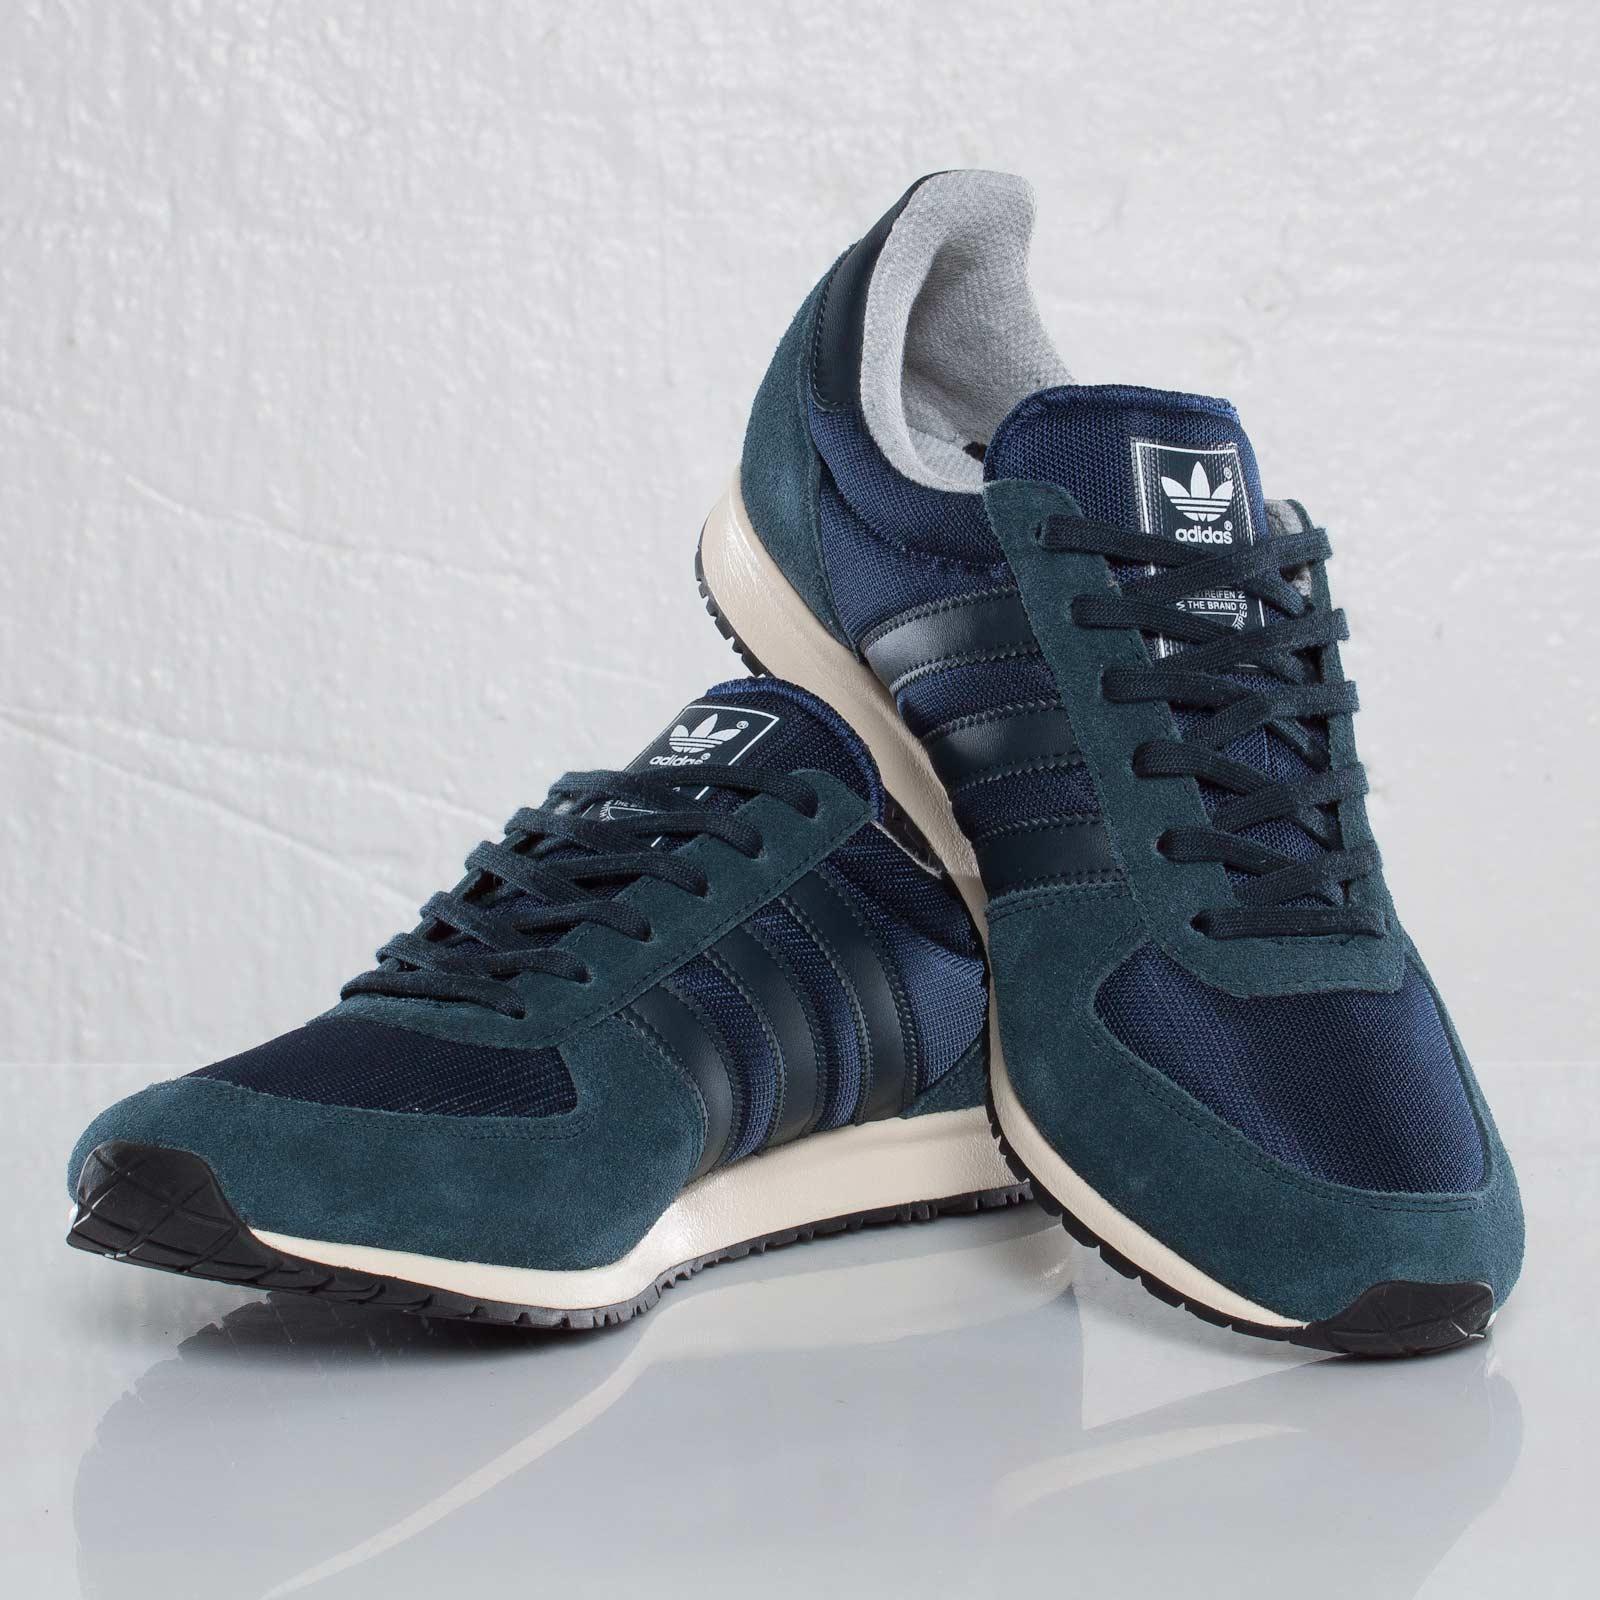 3ac781499f7f33 adidas sneaker adistar racer off 61% - www.vincent4x4-vendee.com